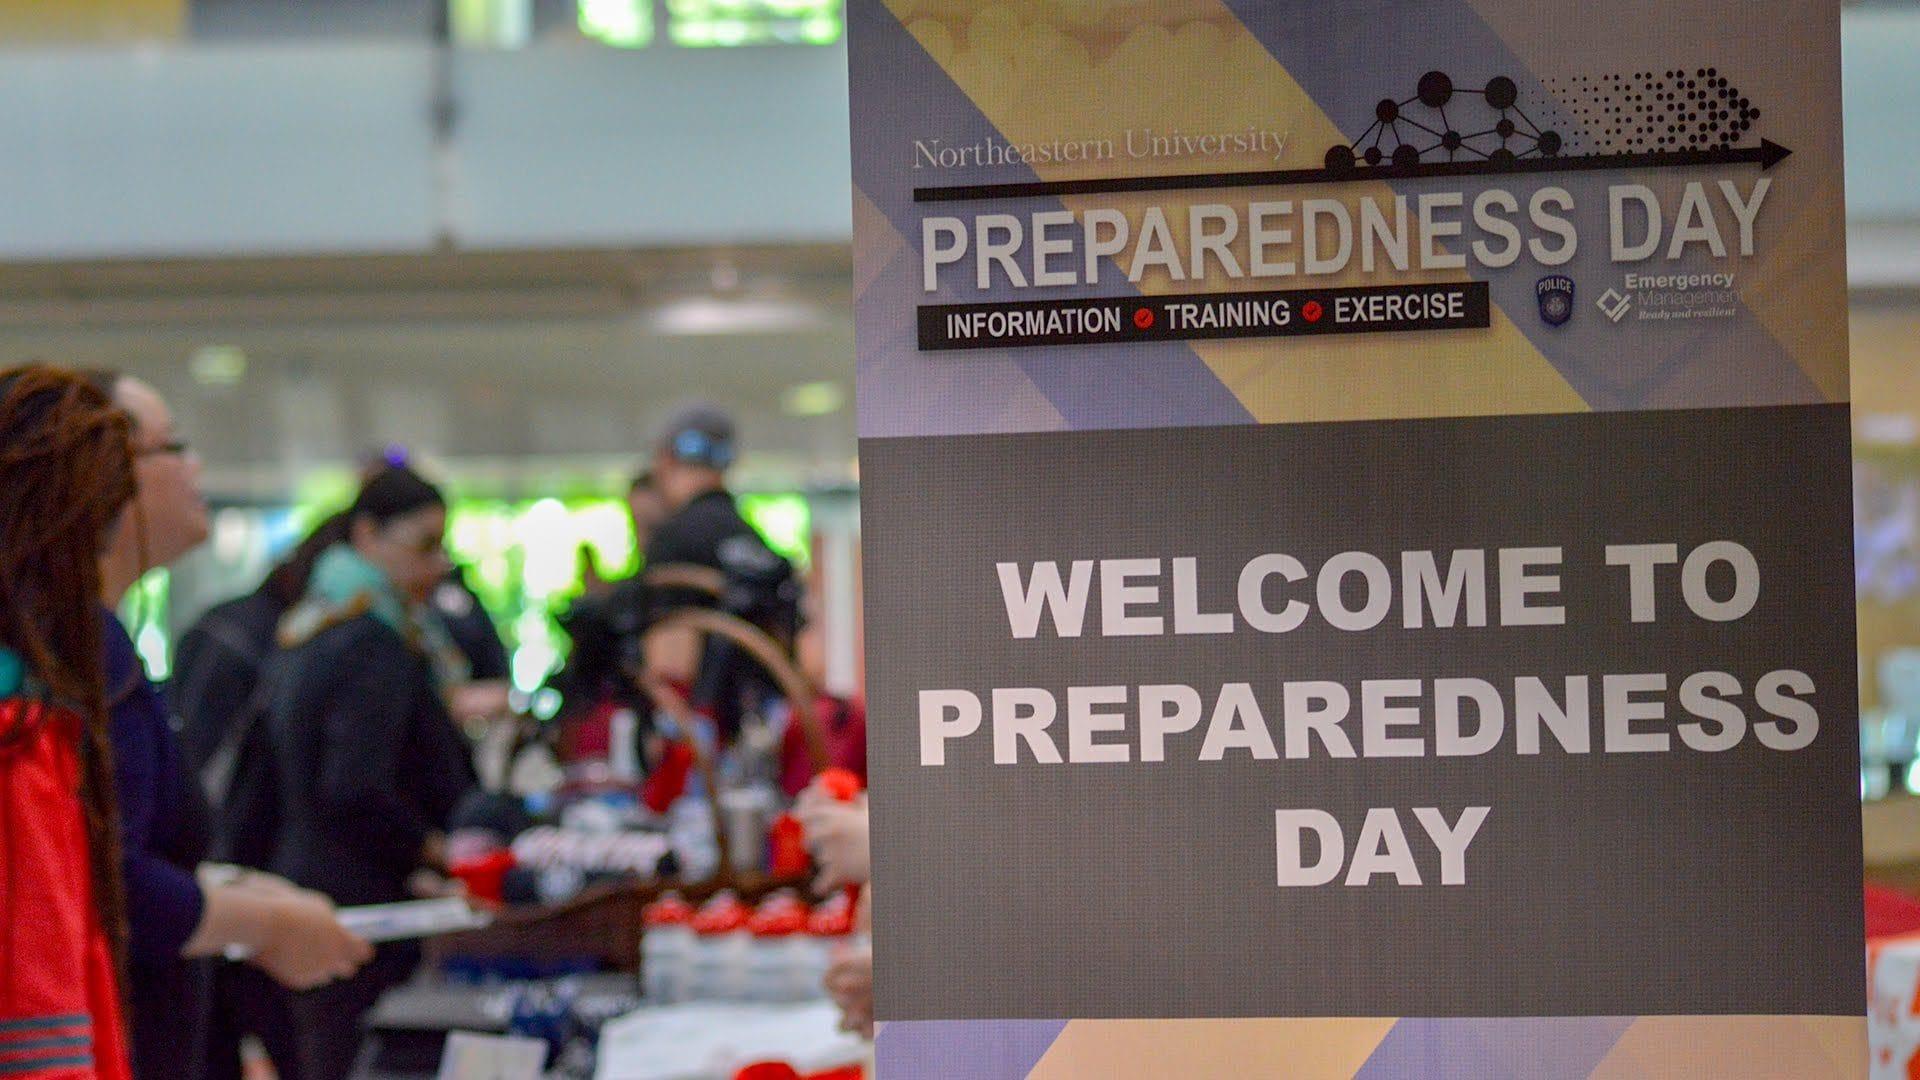 Northeastern University Preparedness Day